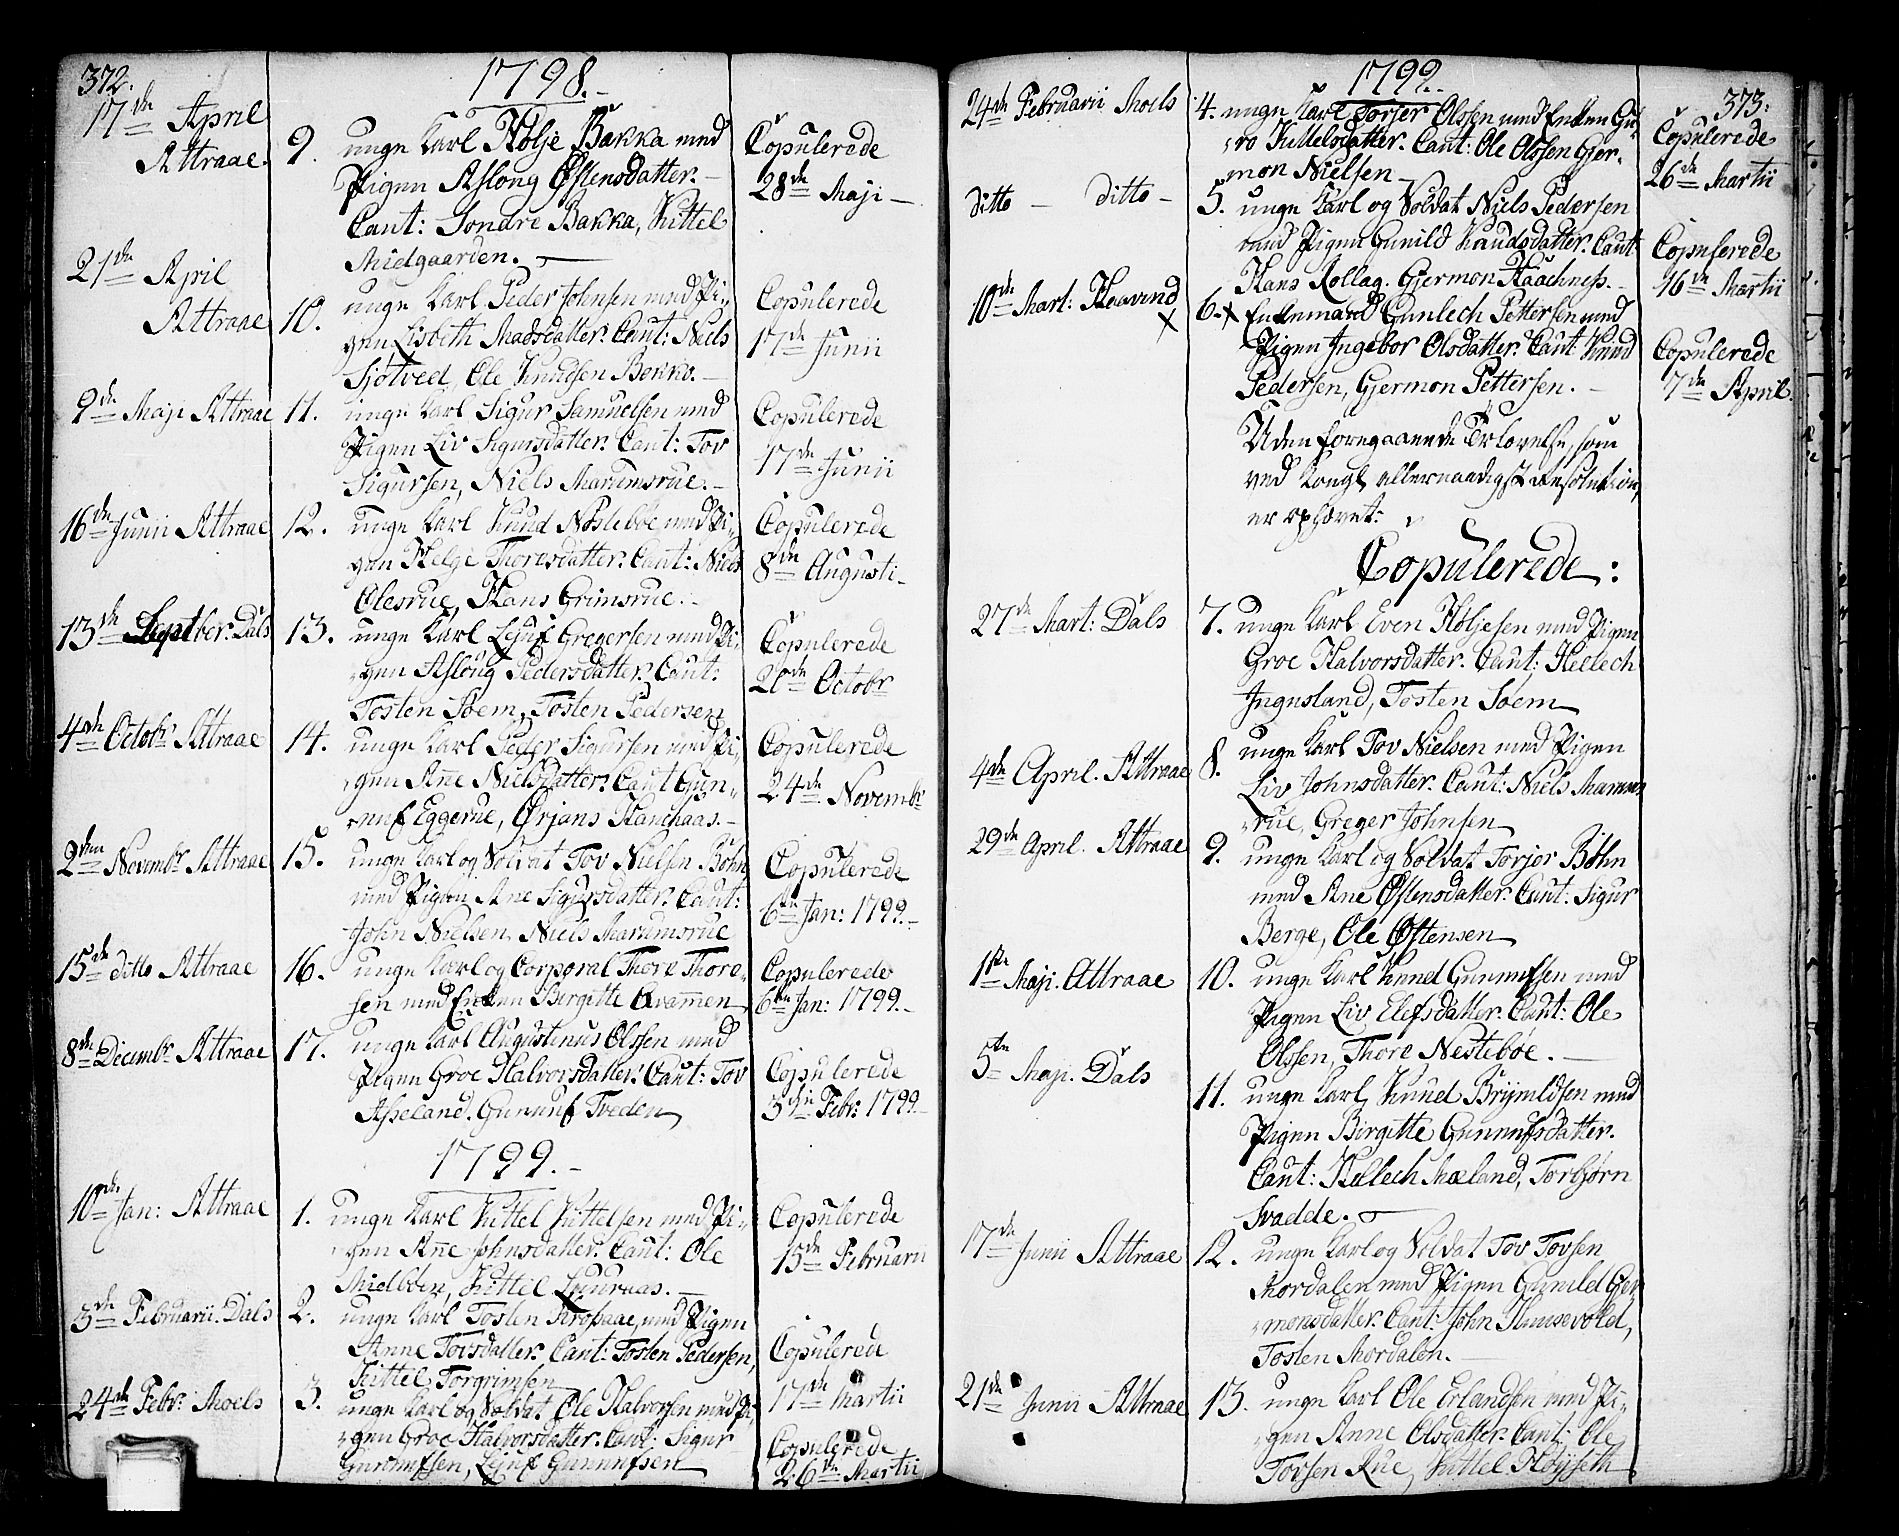 SAKO, Tinn kirkebøker, F/Fa/L0002: Ministerialbok nr. I 2, 1757-1810, s. 372-373